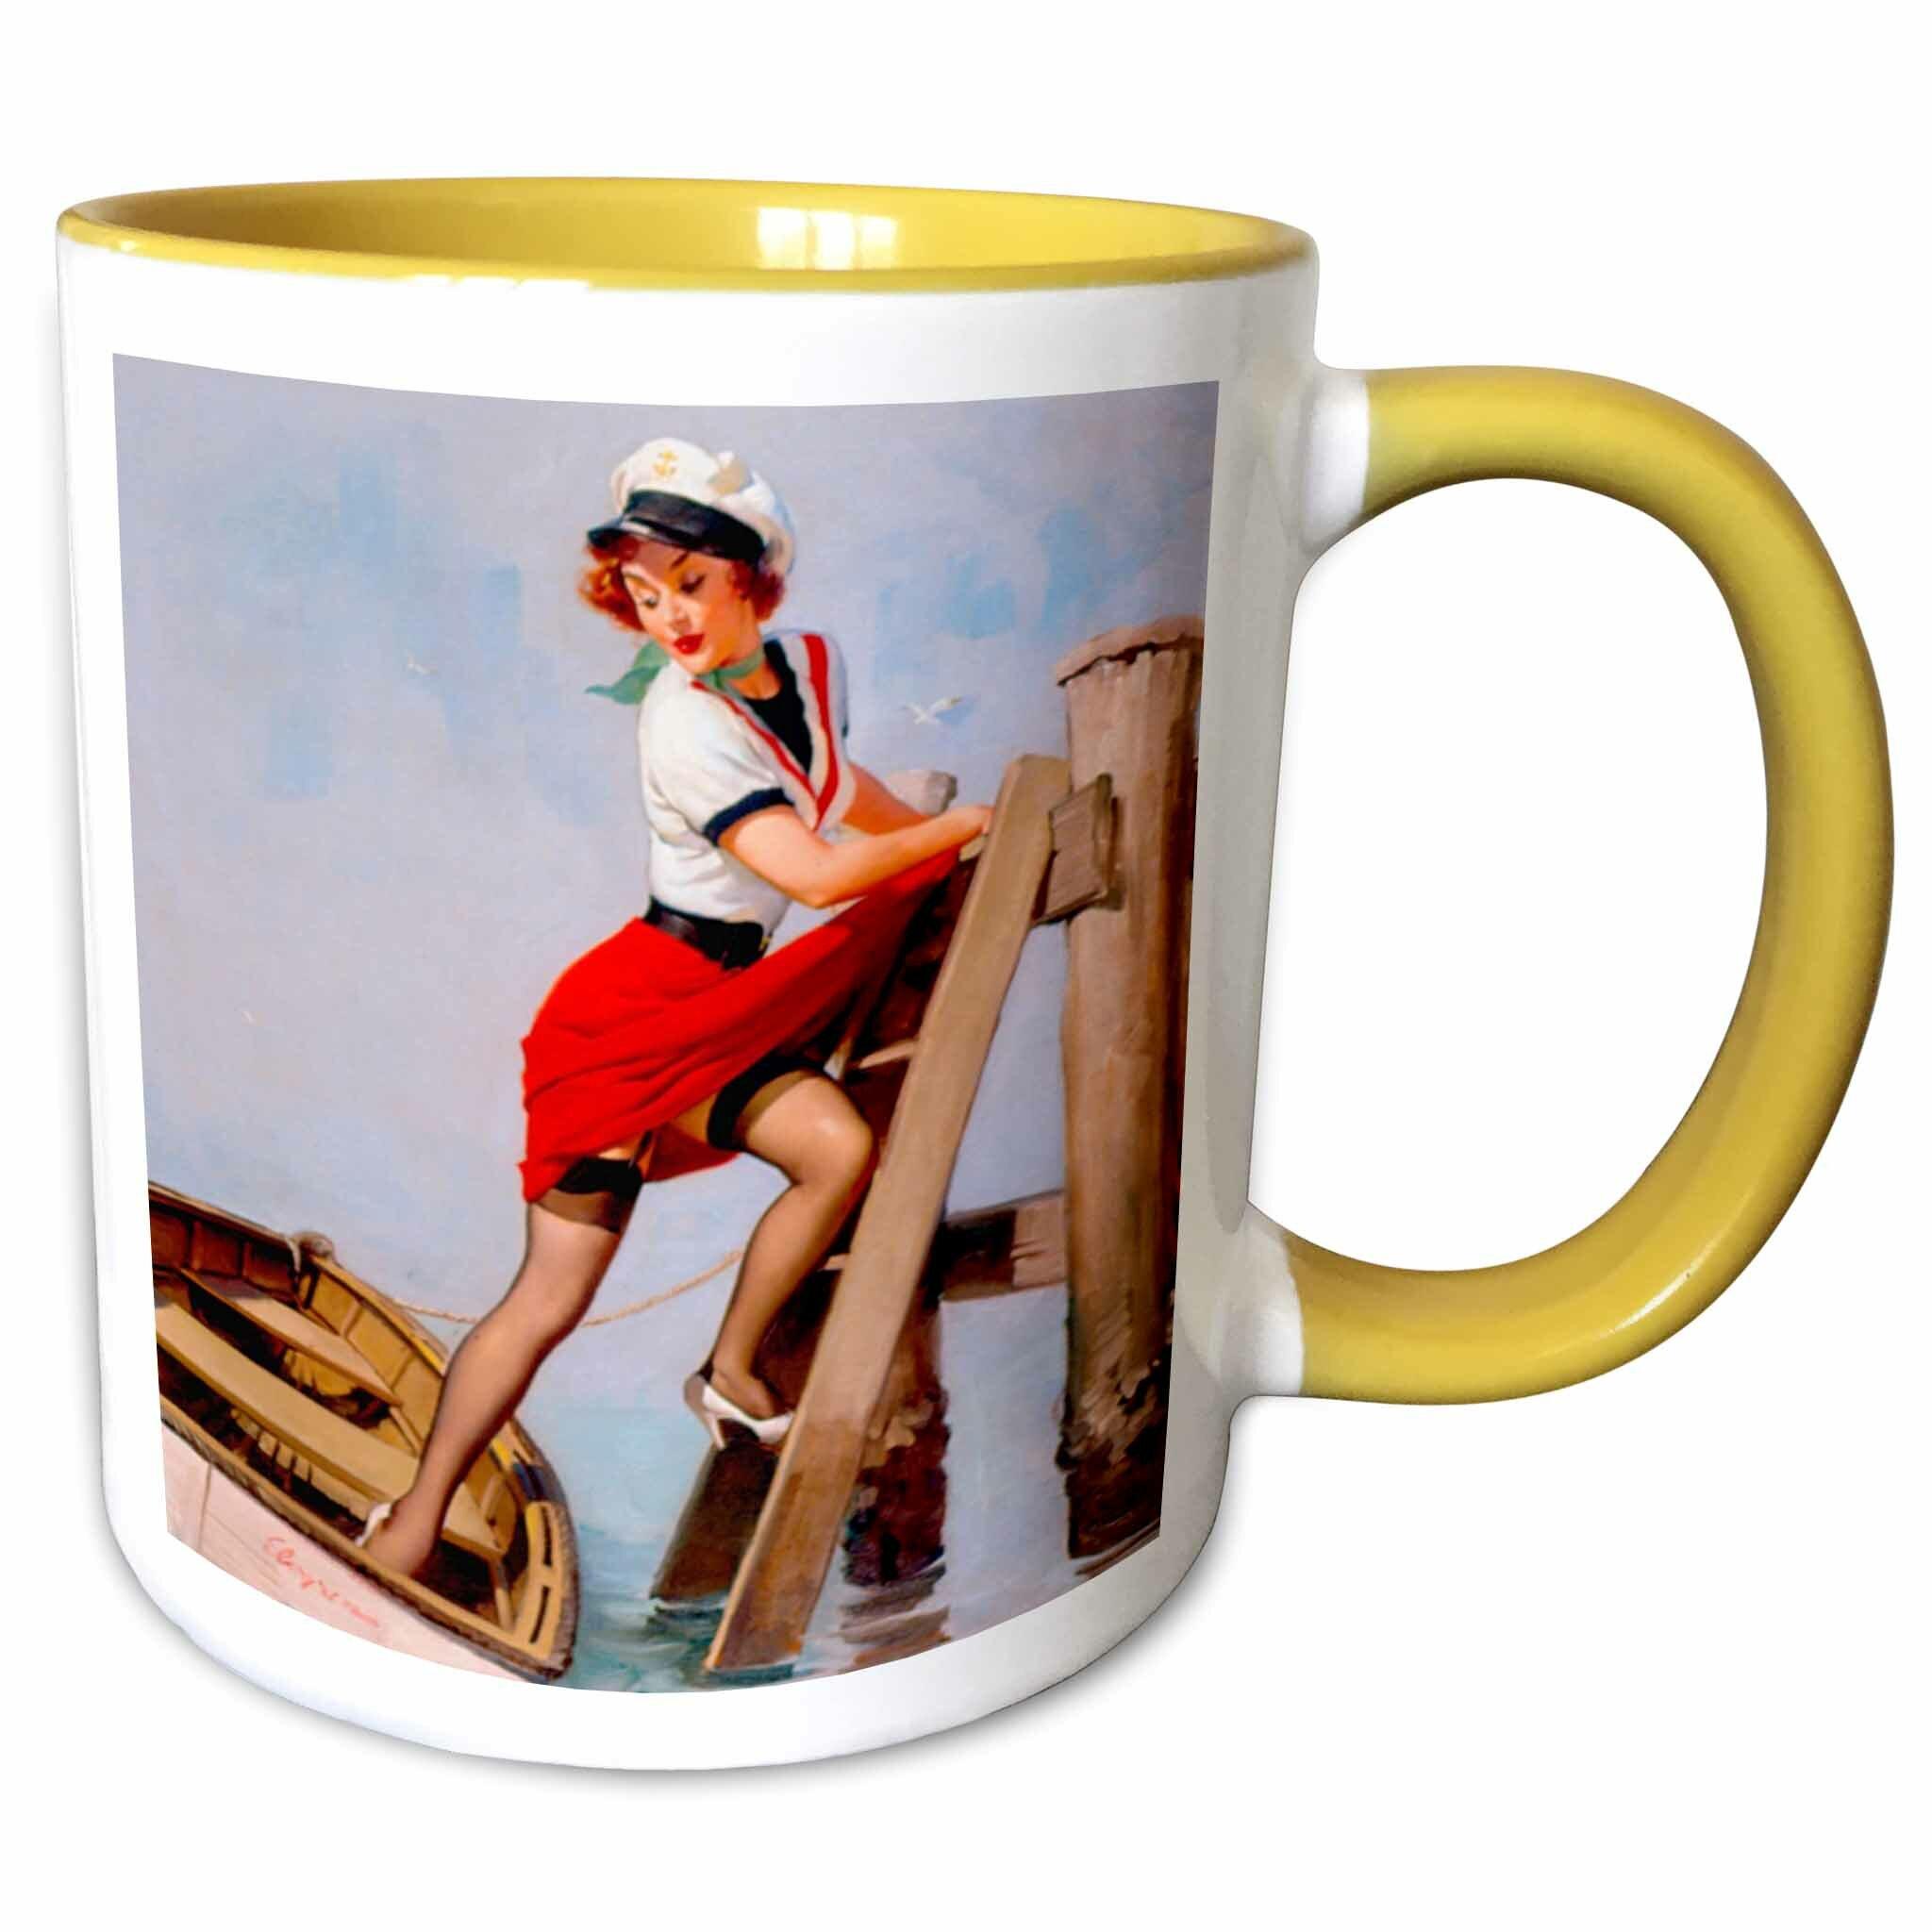 Symple Stuff Maddock Image Of Famous Elvgren Pinup Painting Sailor Beware Coffee Mug Wayfair